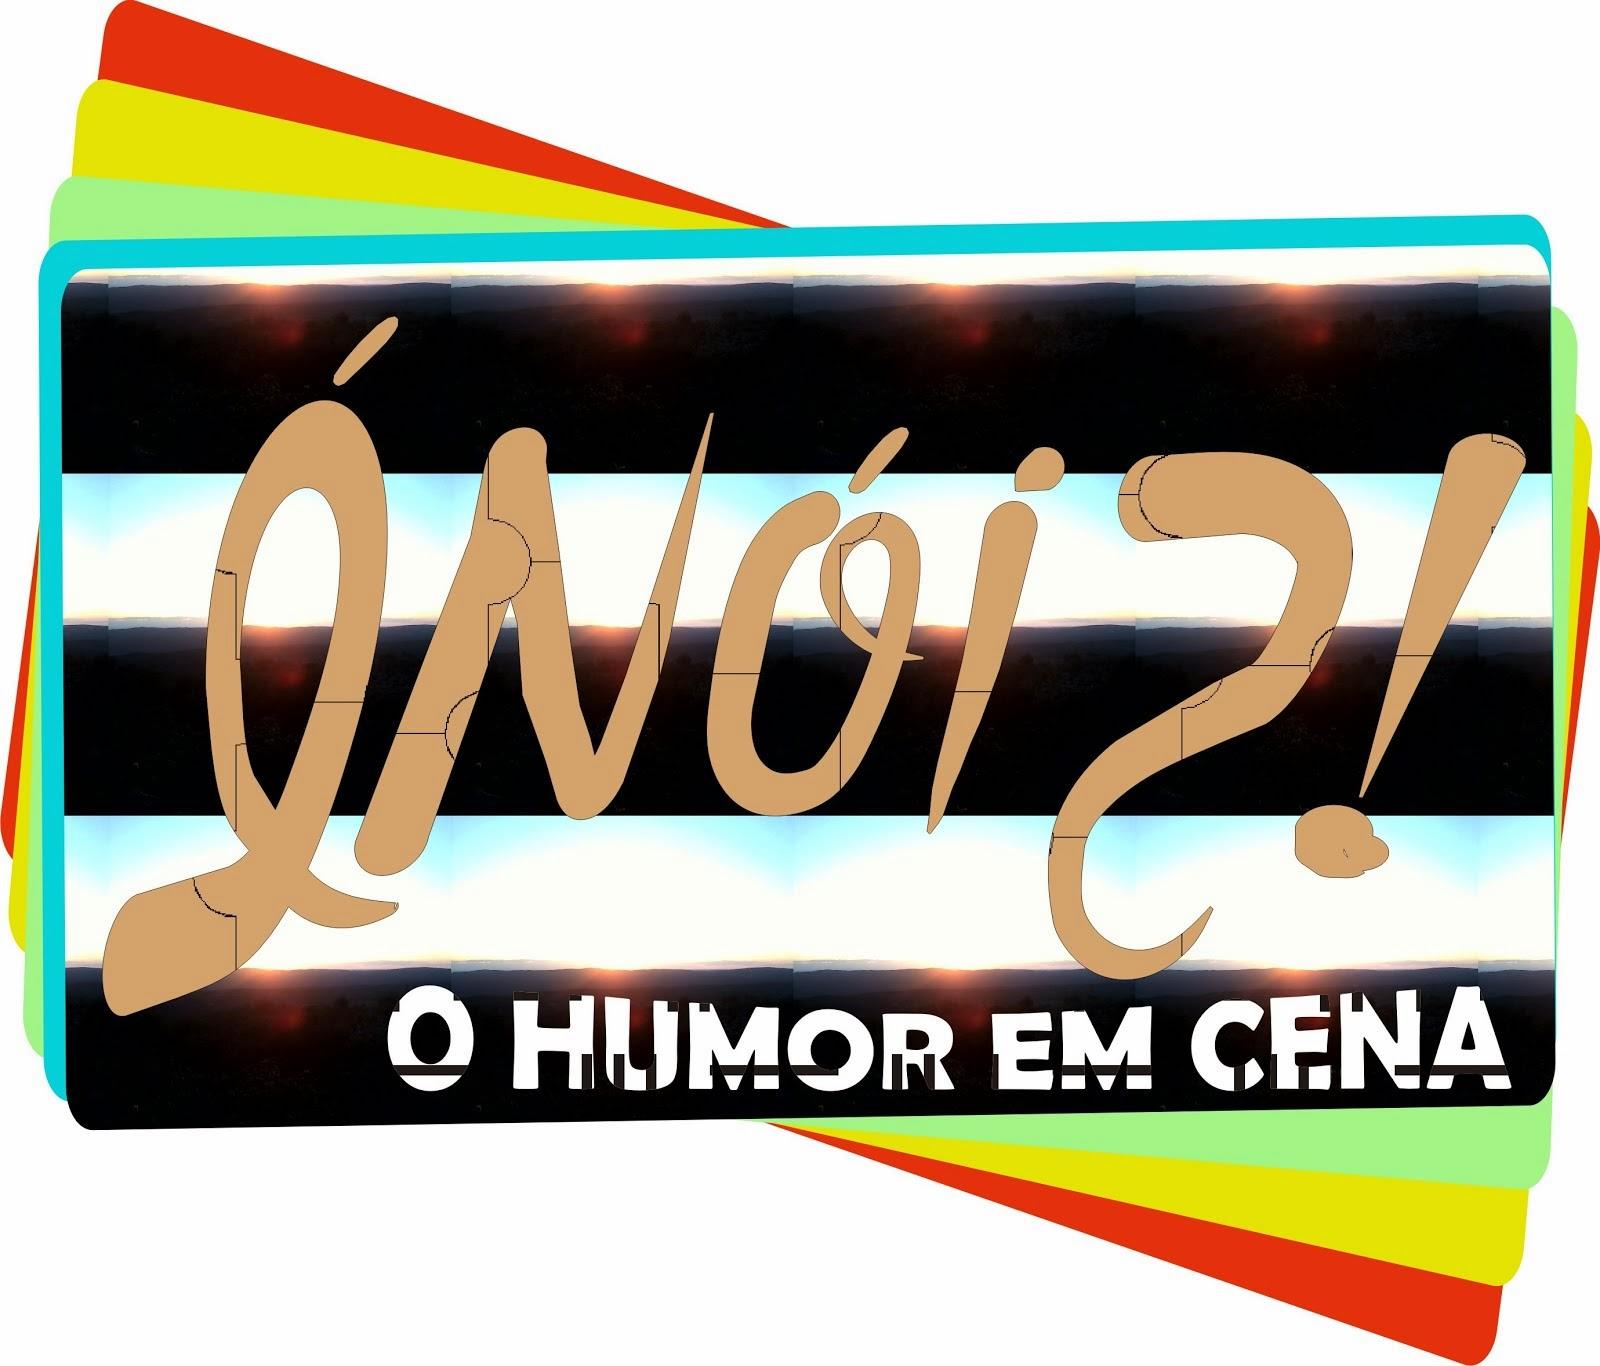 O OLHAR DO PEIXE